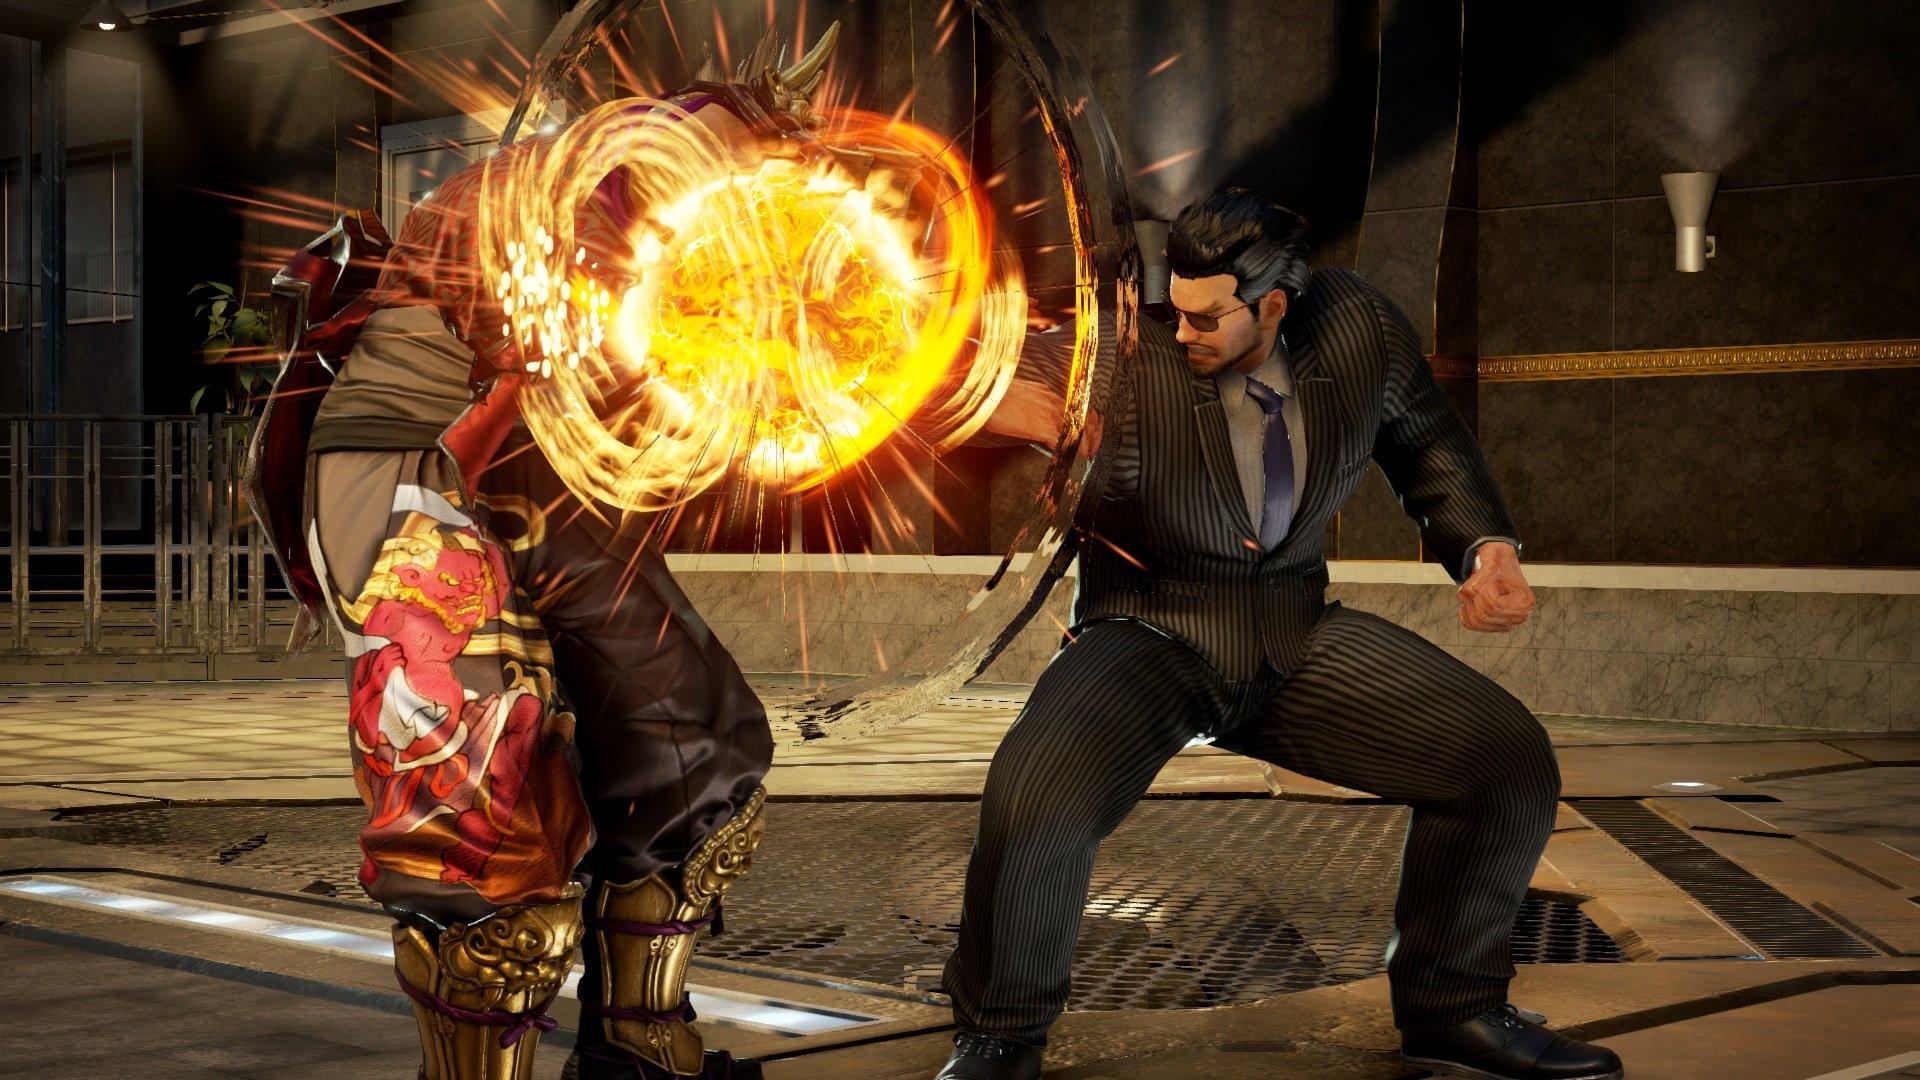 Tekken 7 DLC #13